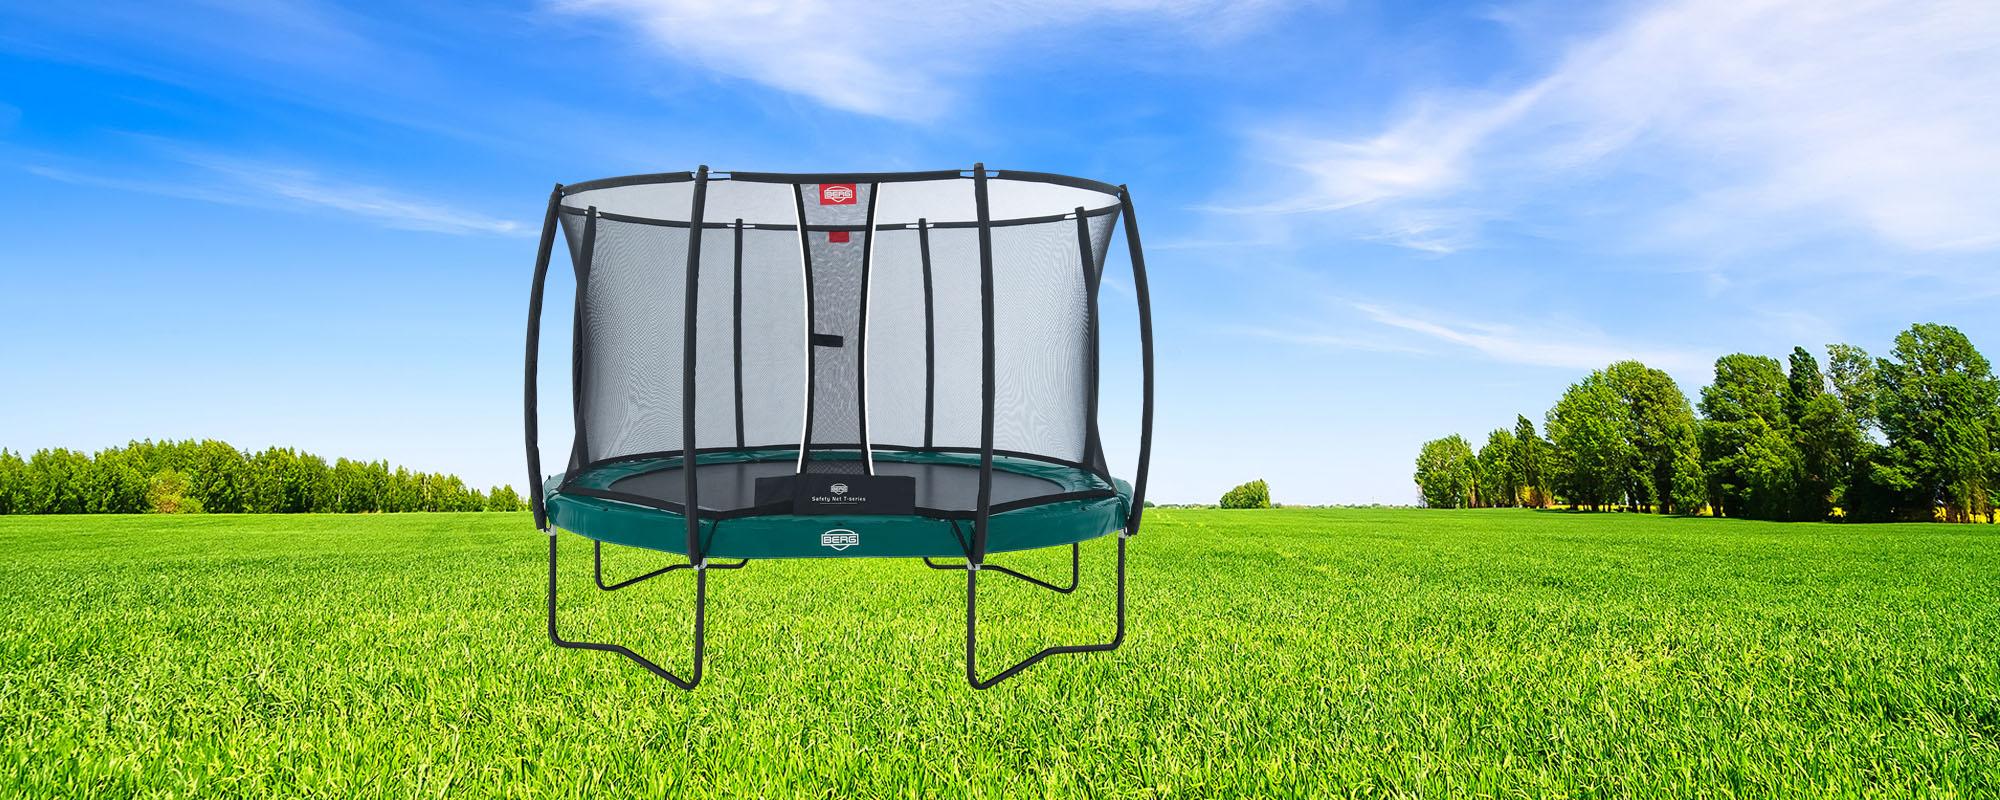 Berg Trampolin Belastbarkeit - Technik Ratgeber trampolin-profi.de